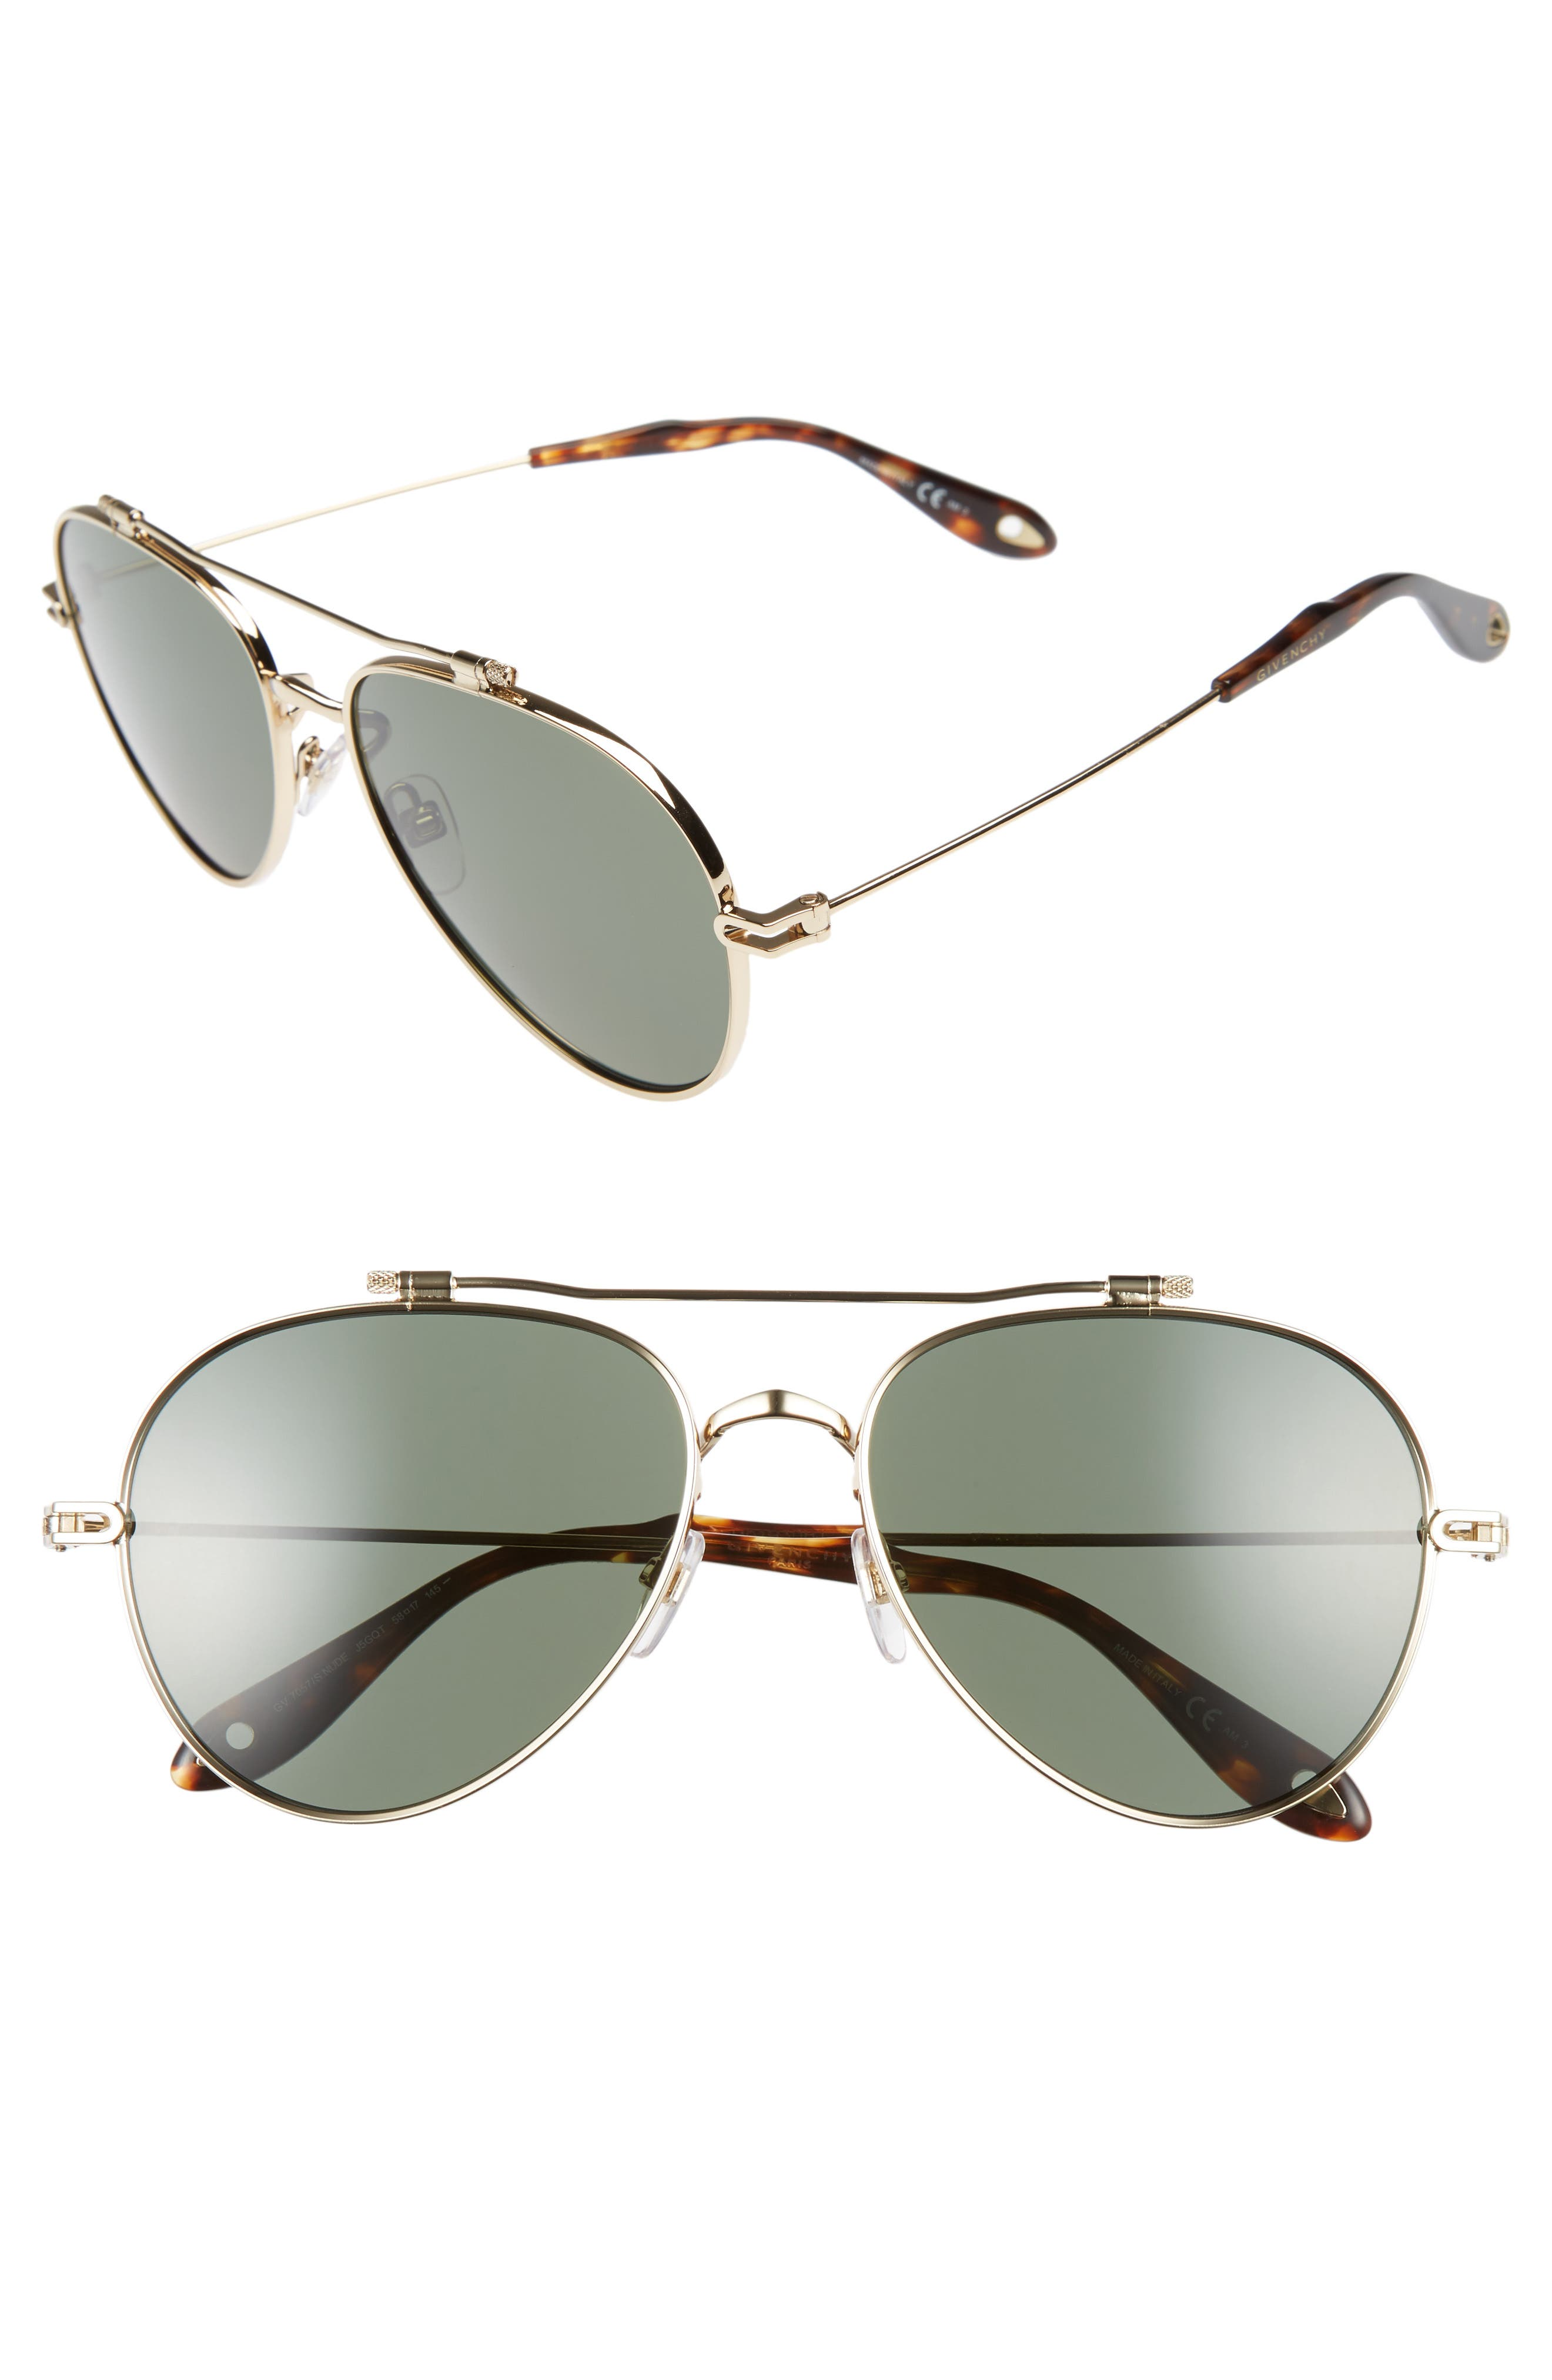 58mm Polarized Aviator Sunglasses,                         Main,                         color, GOLD